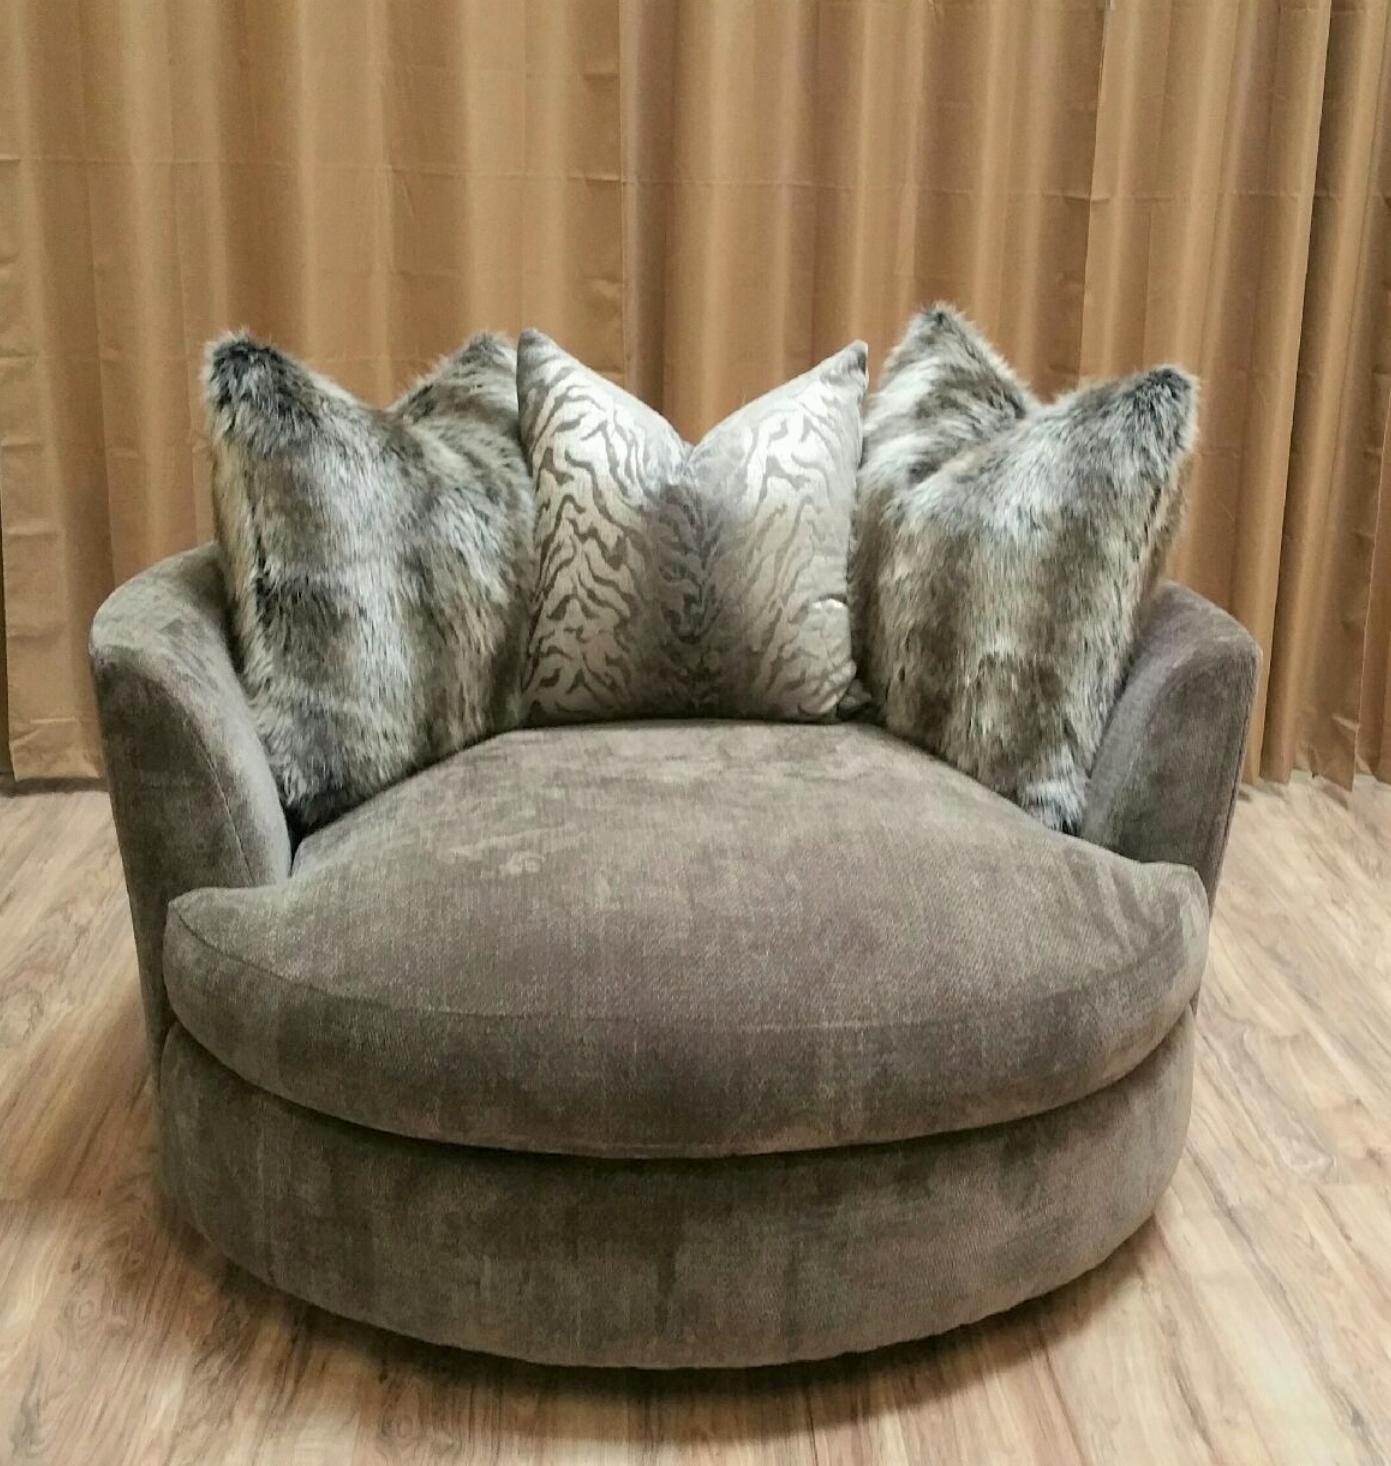 Superb Furniture Couches Sectionals Sofas John Michael Designs Llc Beatyapartments Chair Design Images Beatyapartmentscom